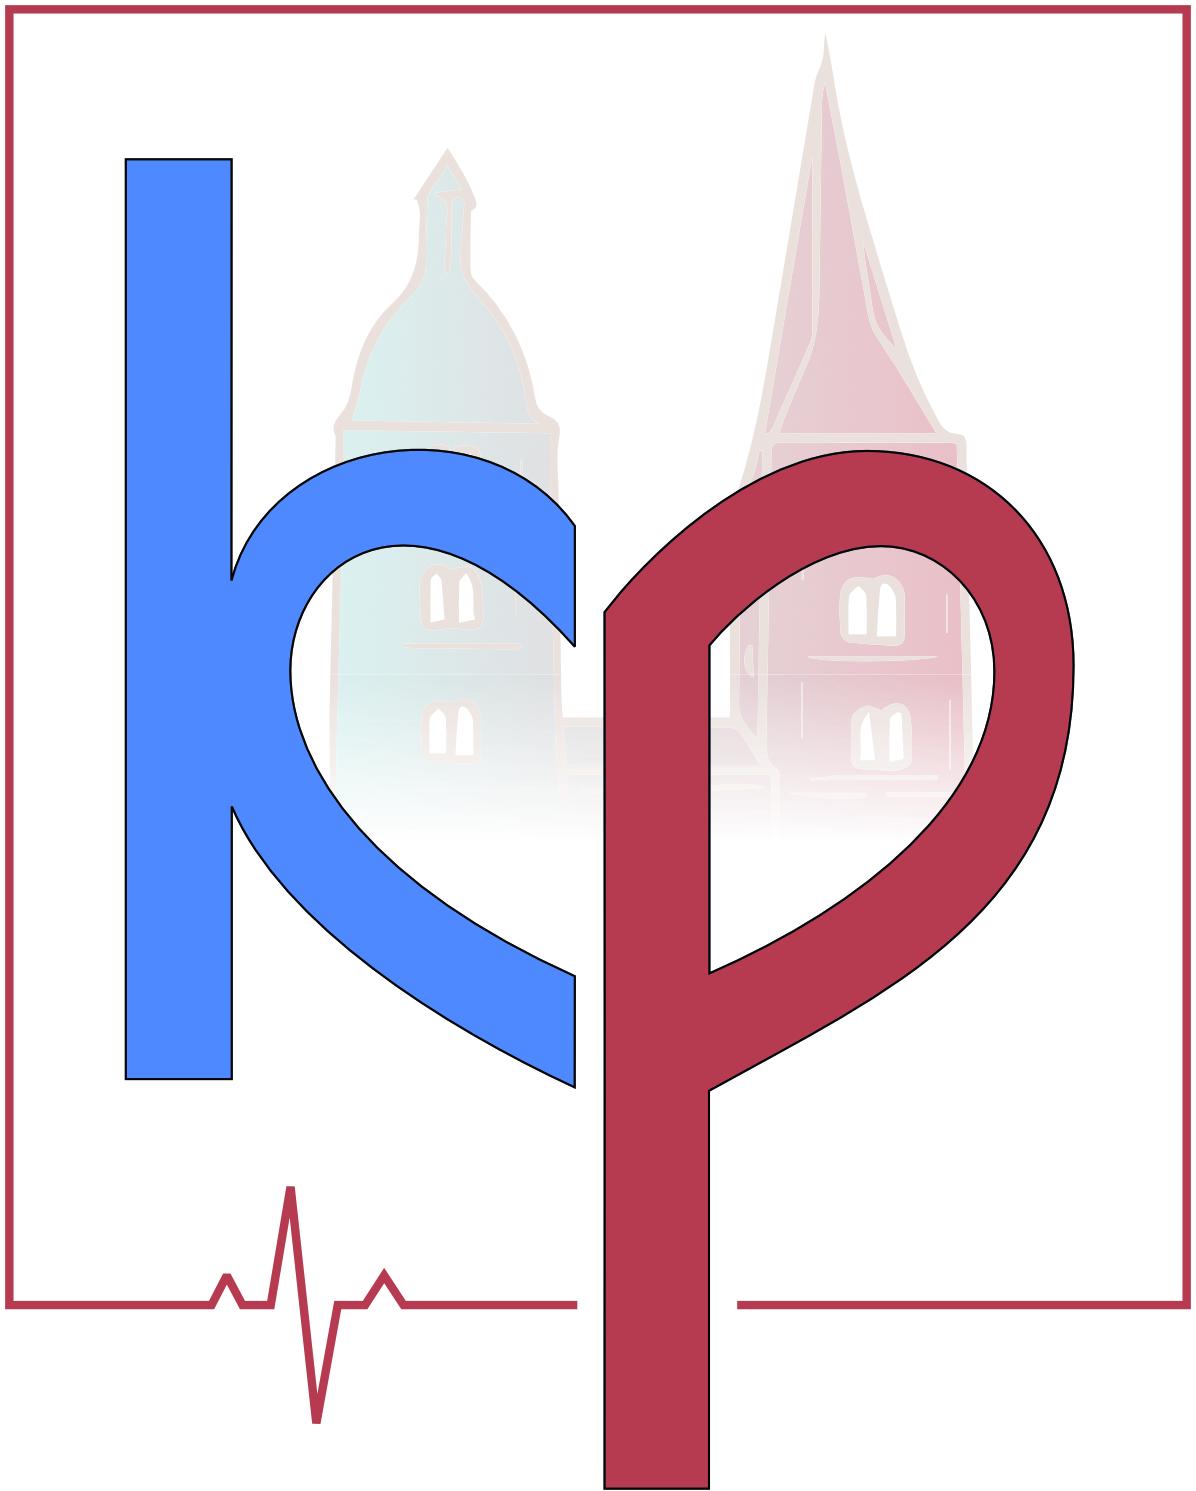 Kardiologisch-Hausärztliche Praxis Kerstin Pauli